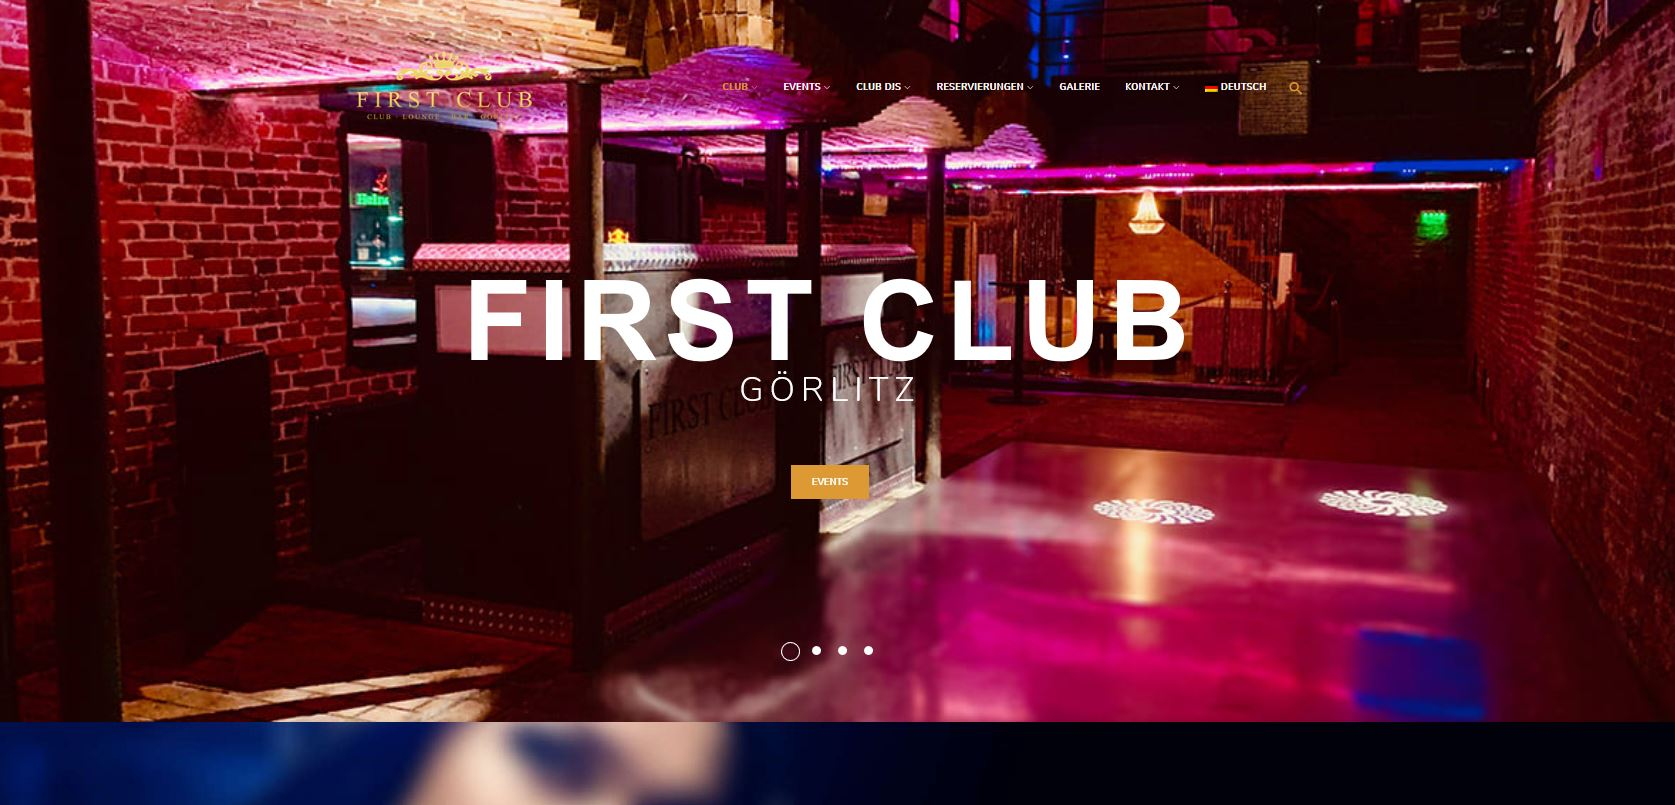 First-Club.de